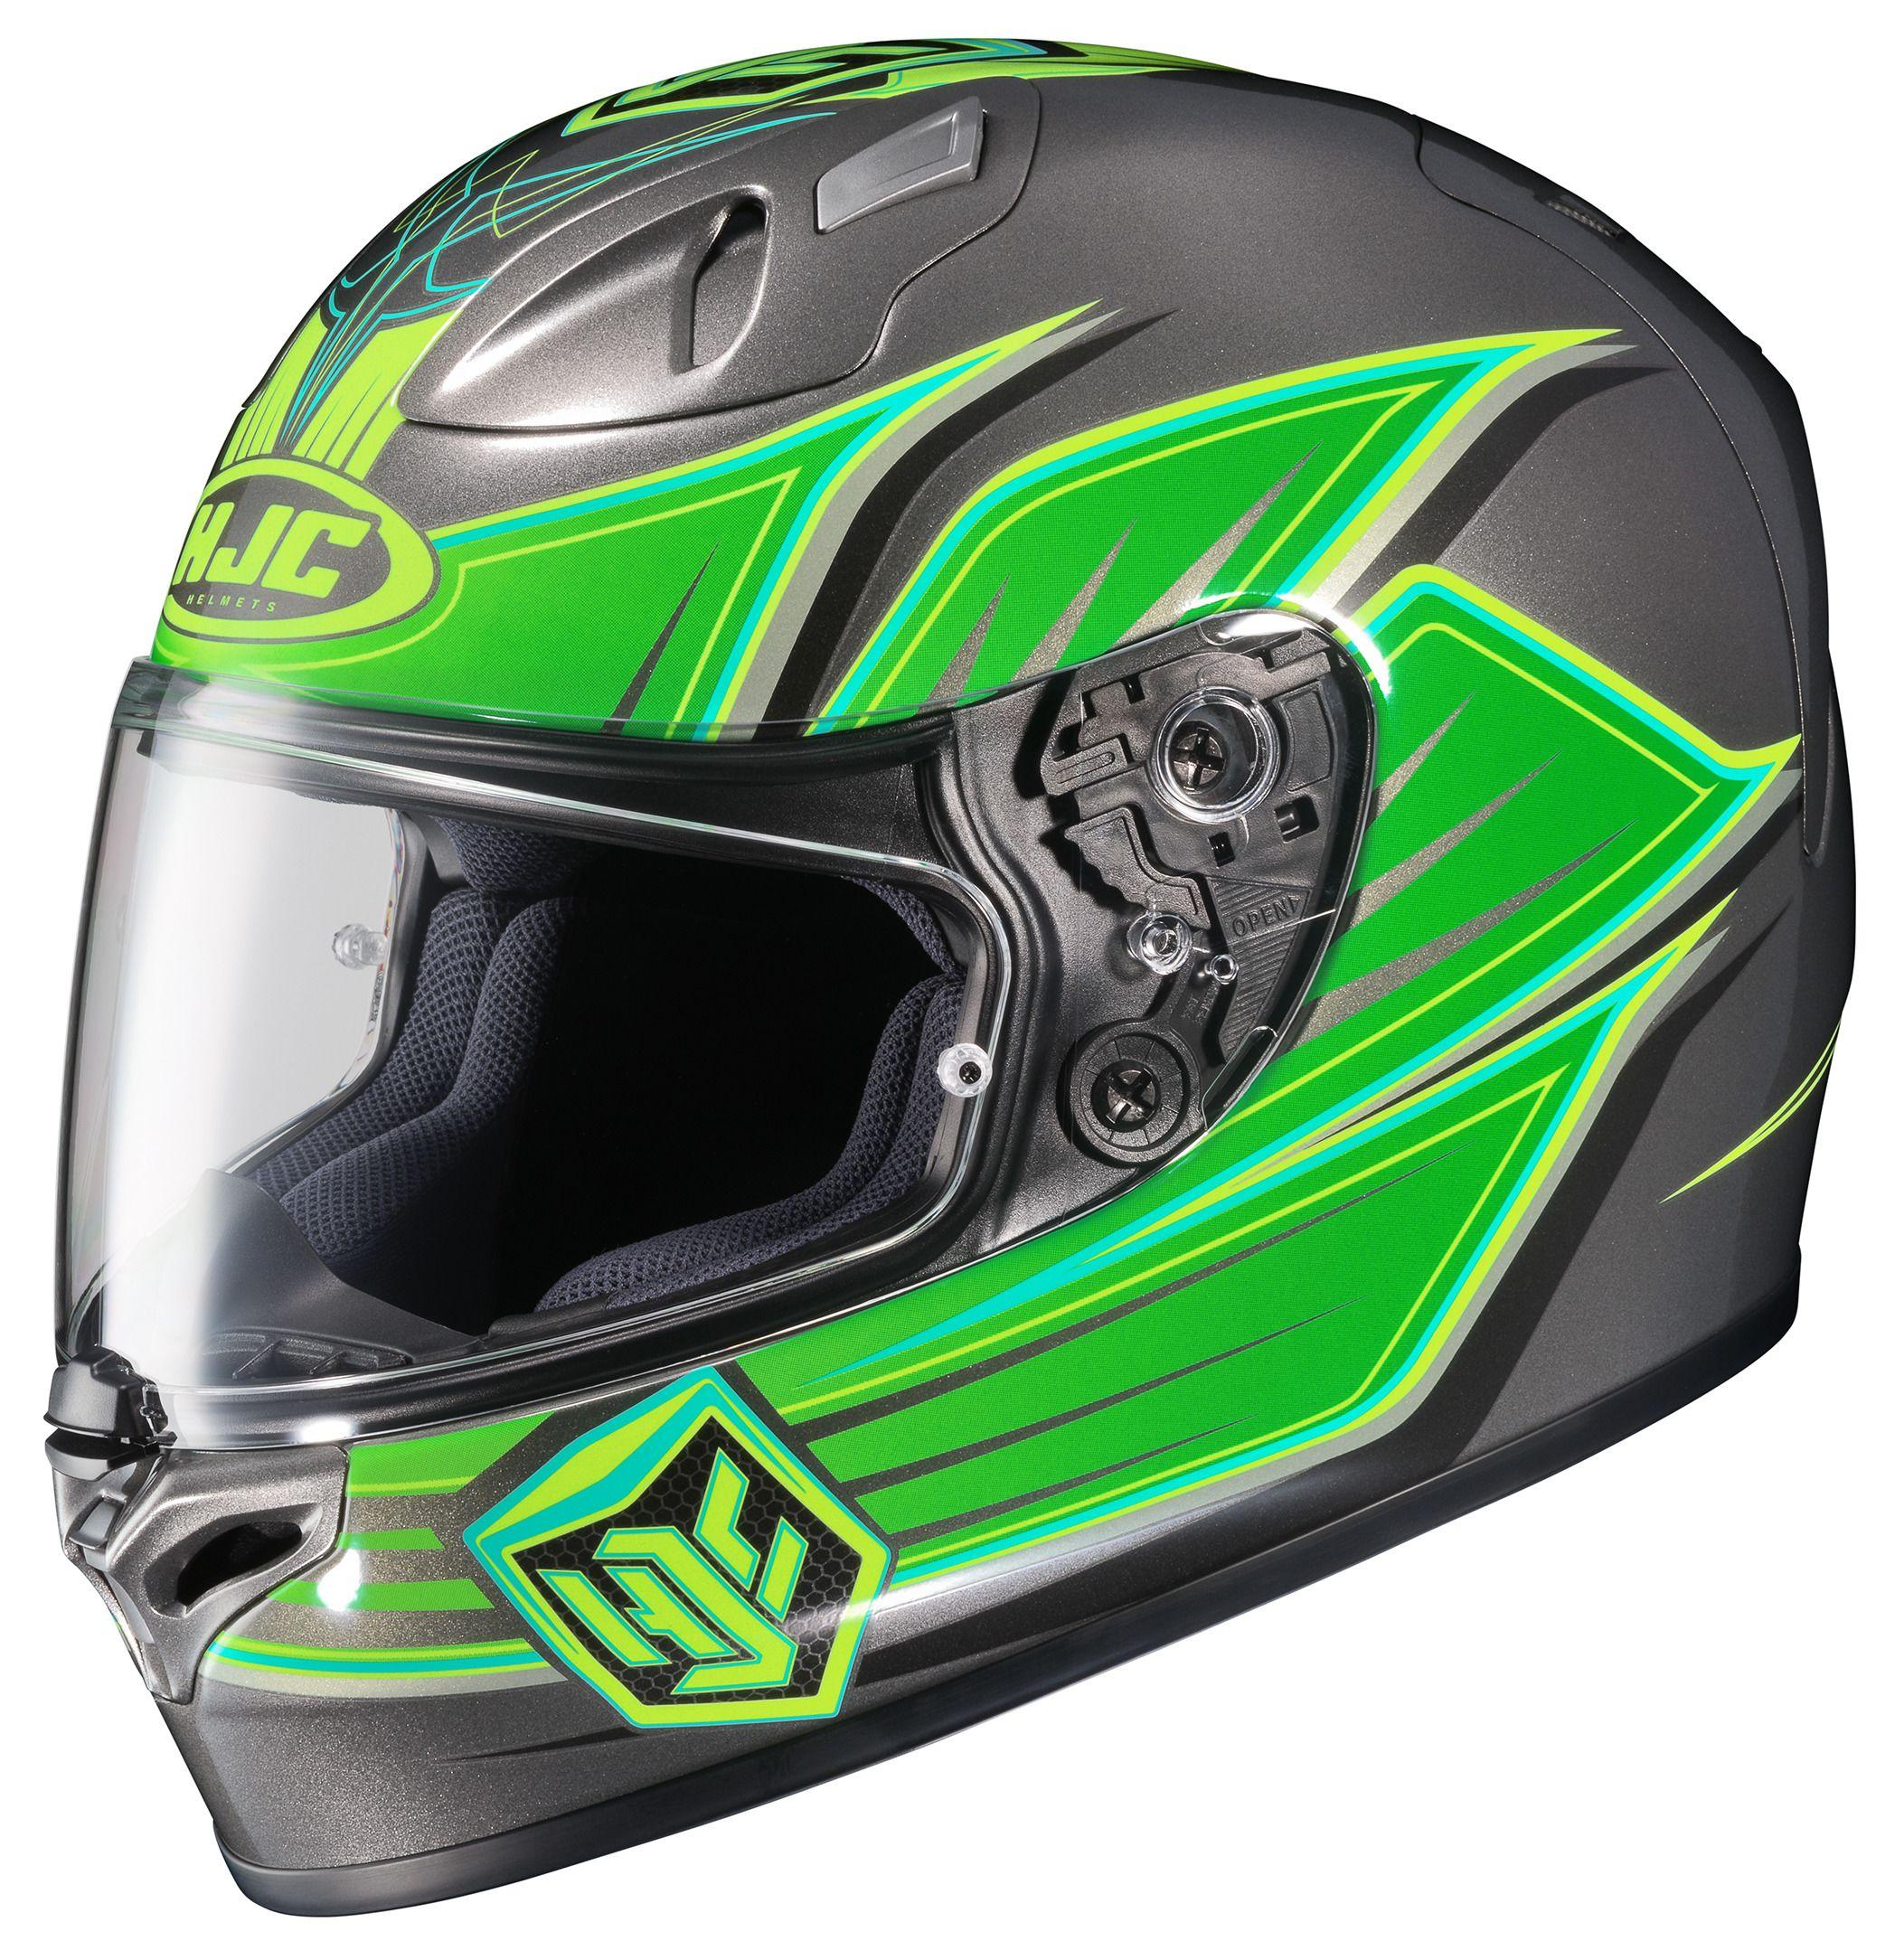 Hjc Fg 17 >> HJC FG-17 Banshee Helmet (Size 2XL Only) | 50% ($100.00) Off! - RevZilla